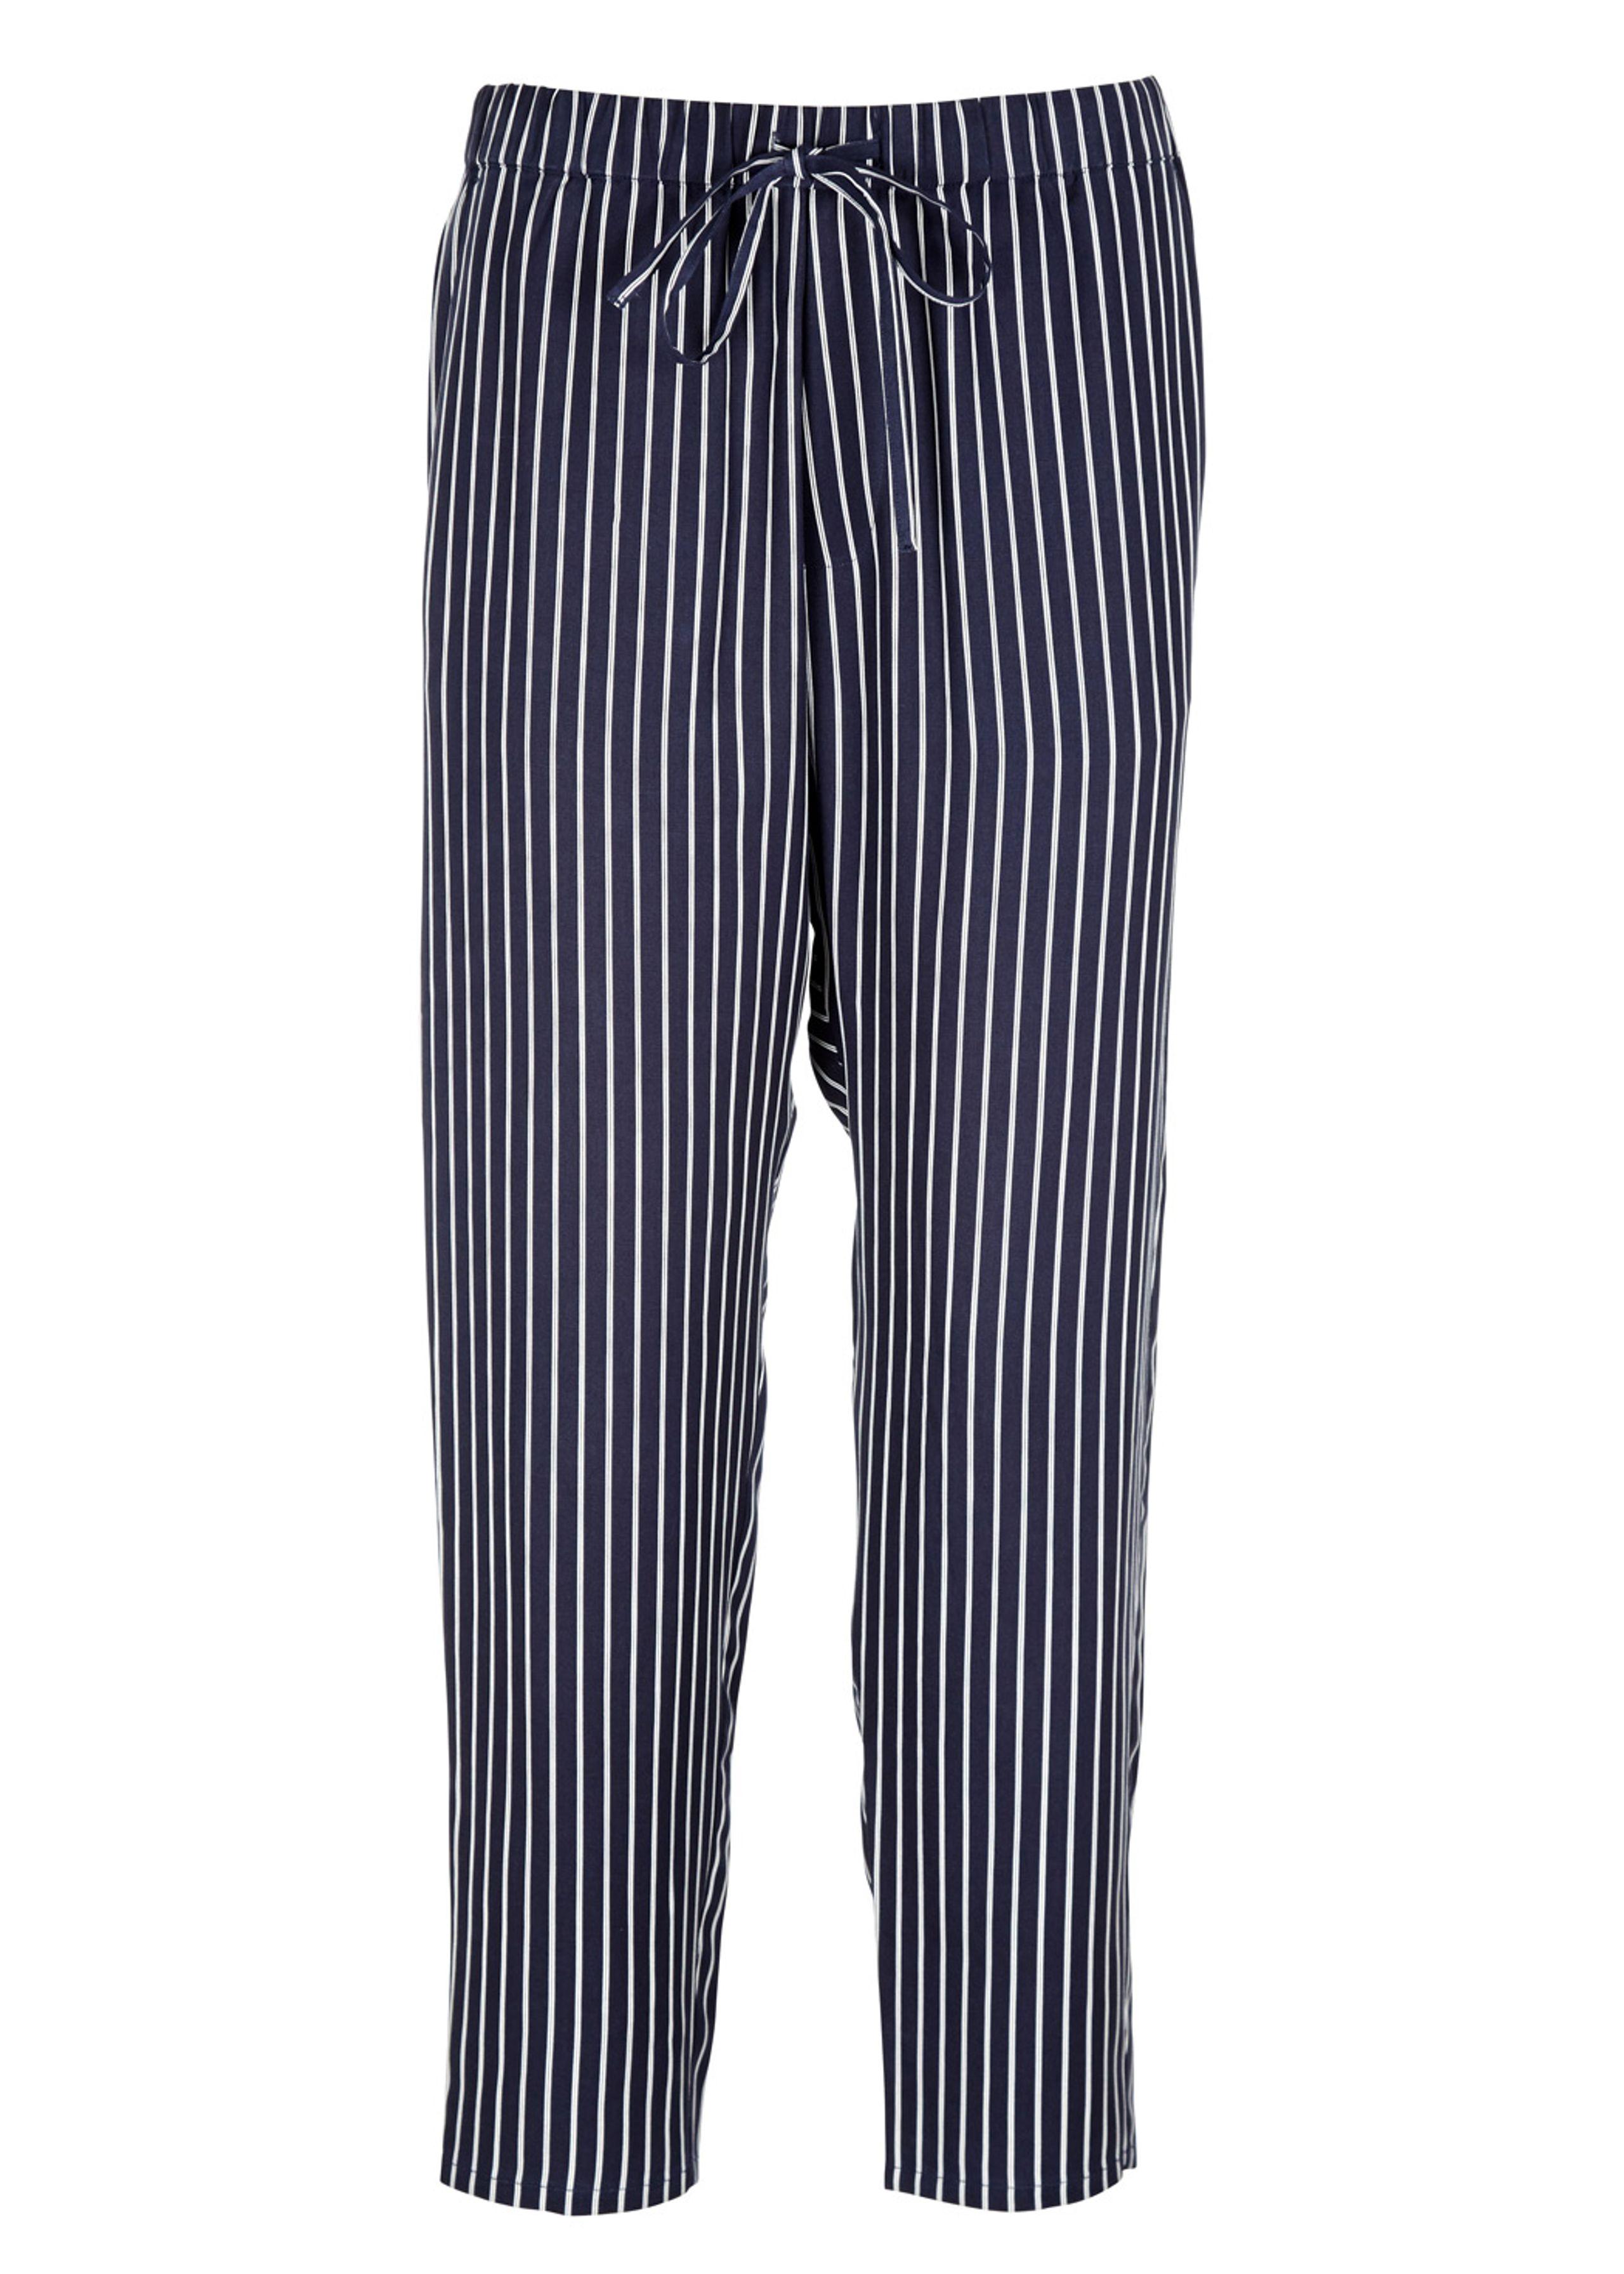 Flow trouser